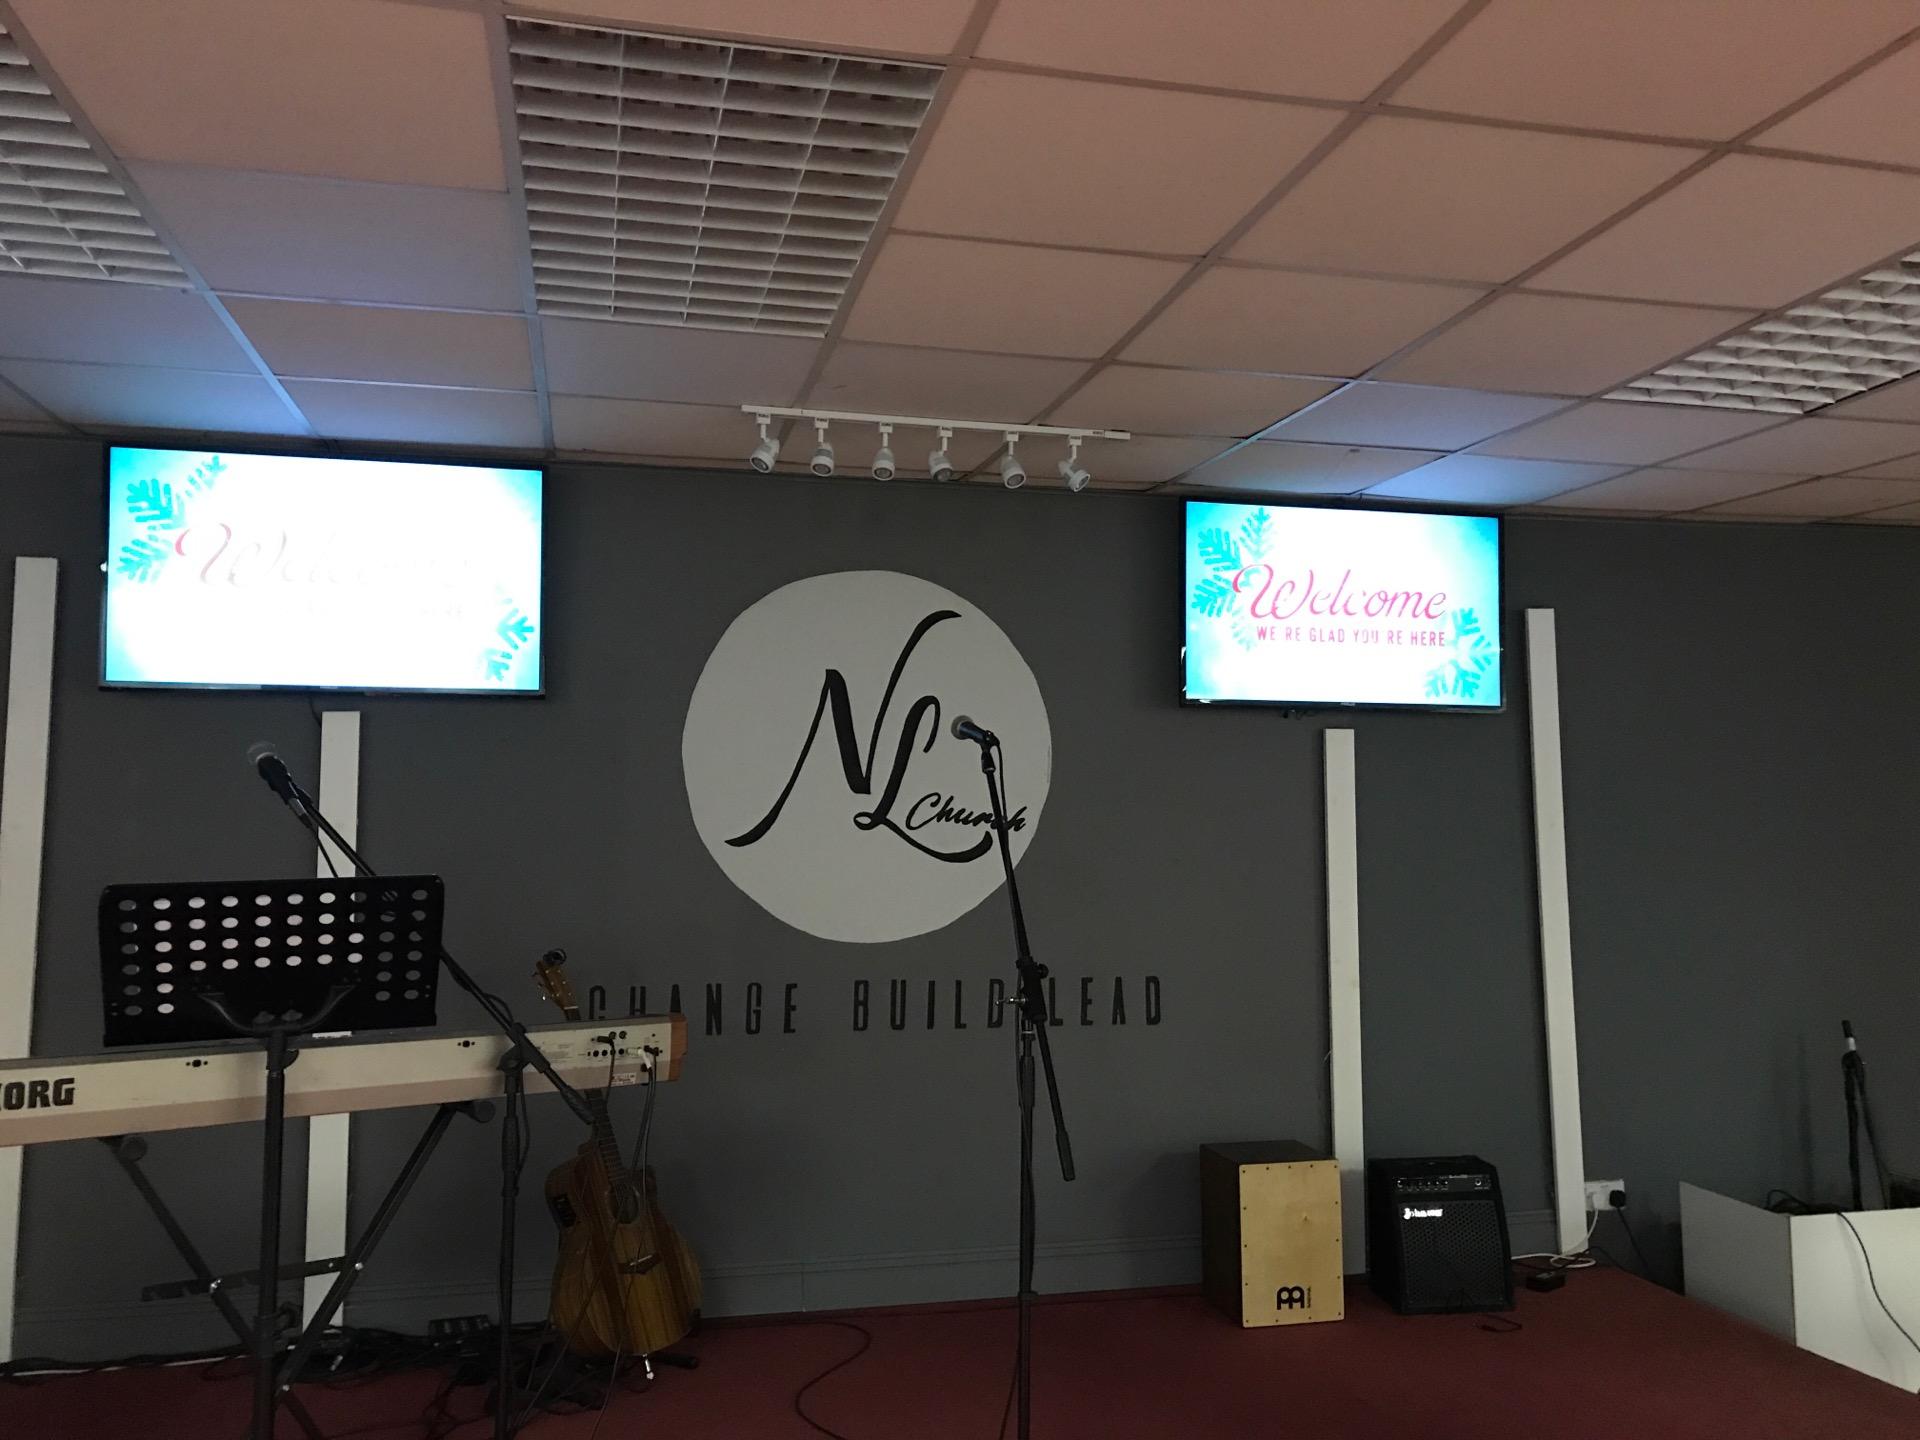 New Life Christian Centre | Ardarostig, Bishopstown | +353 21 464 1120